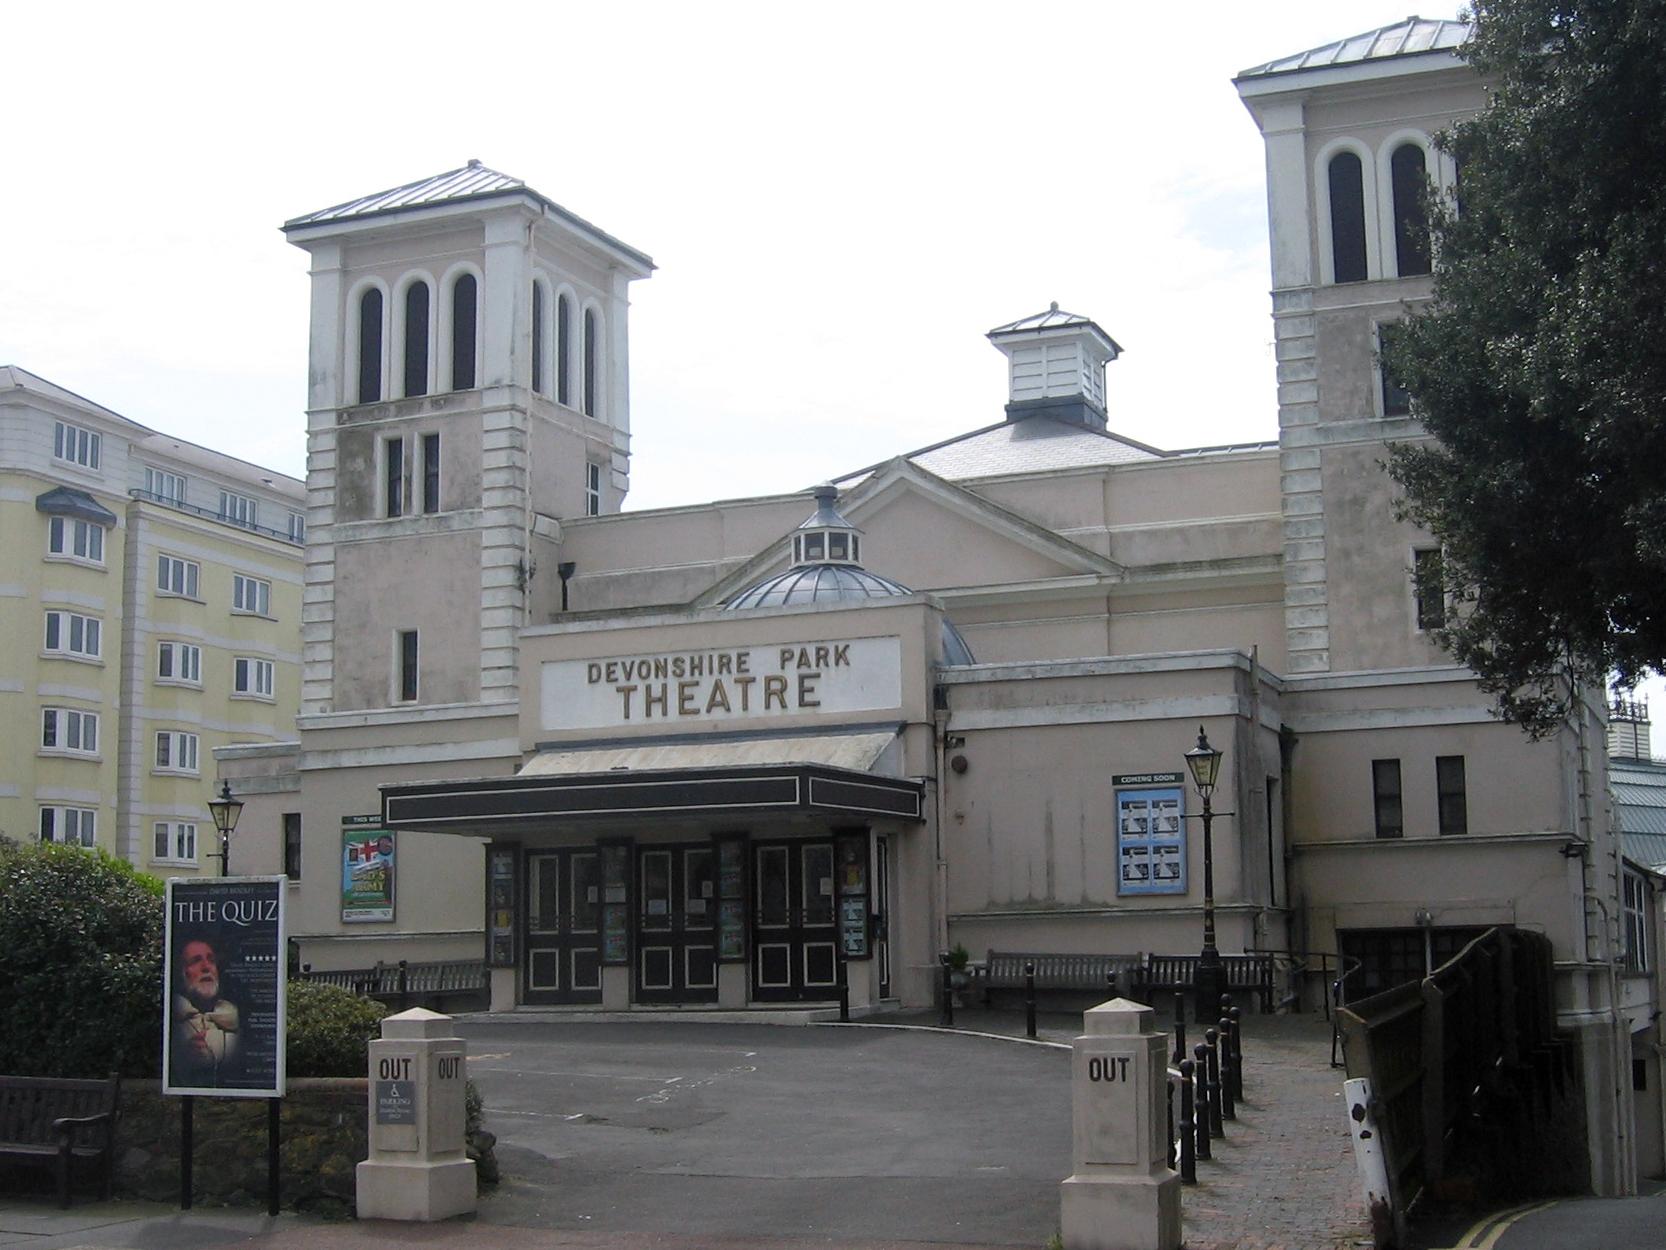 Devonshire park theatre wikiwand for The devonshire